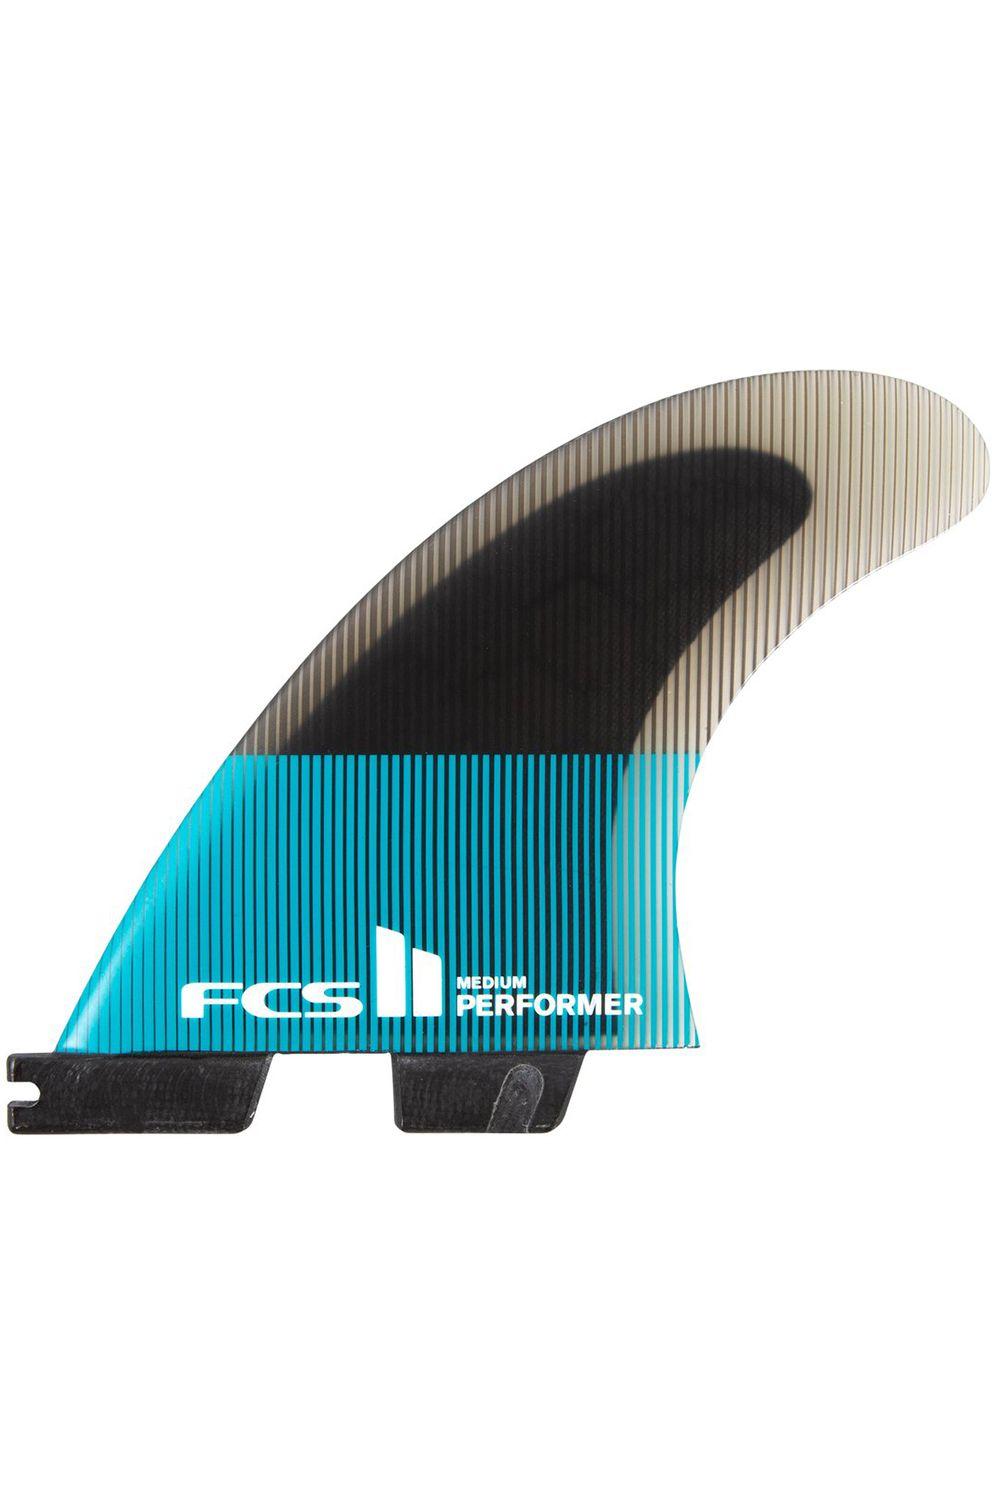 Fcs Fins II PERFORMER PC SMALL TEAL/BLACK QUAD Quad FCS II S